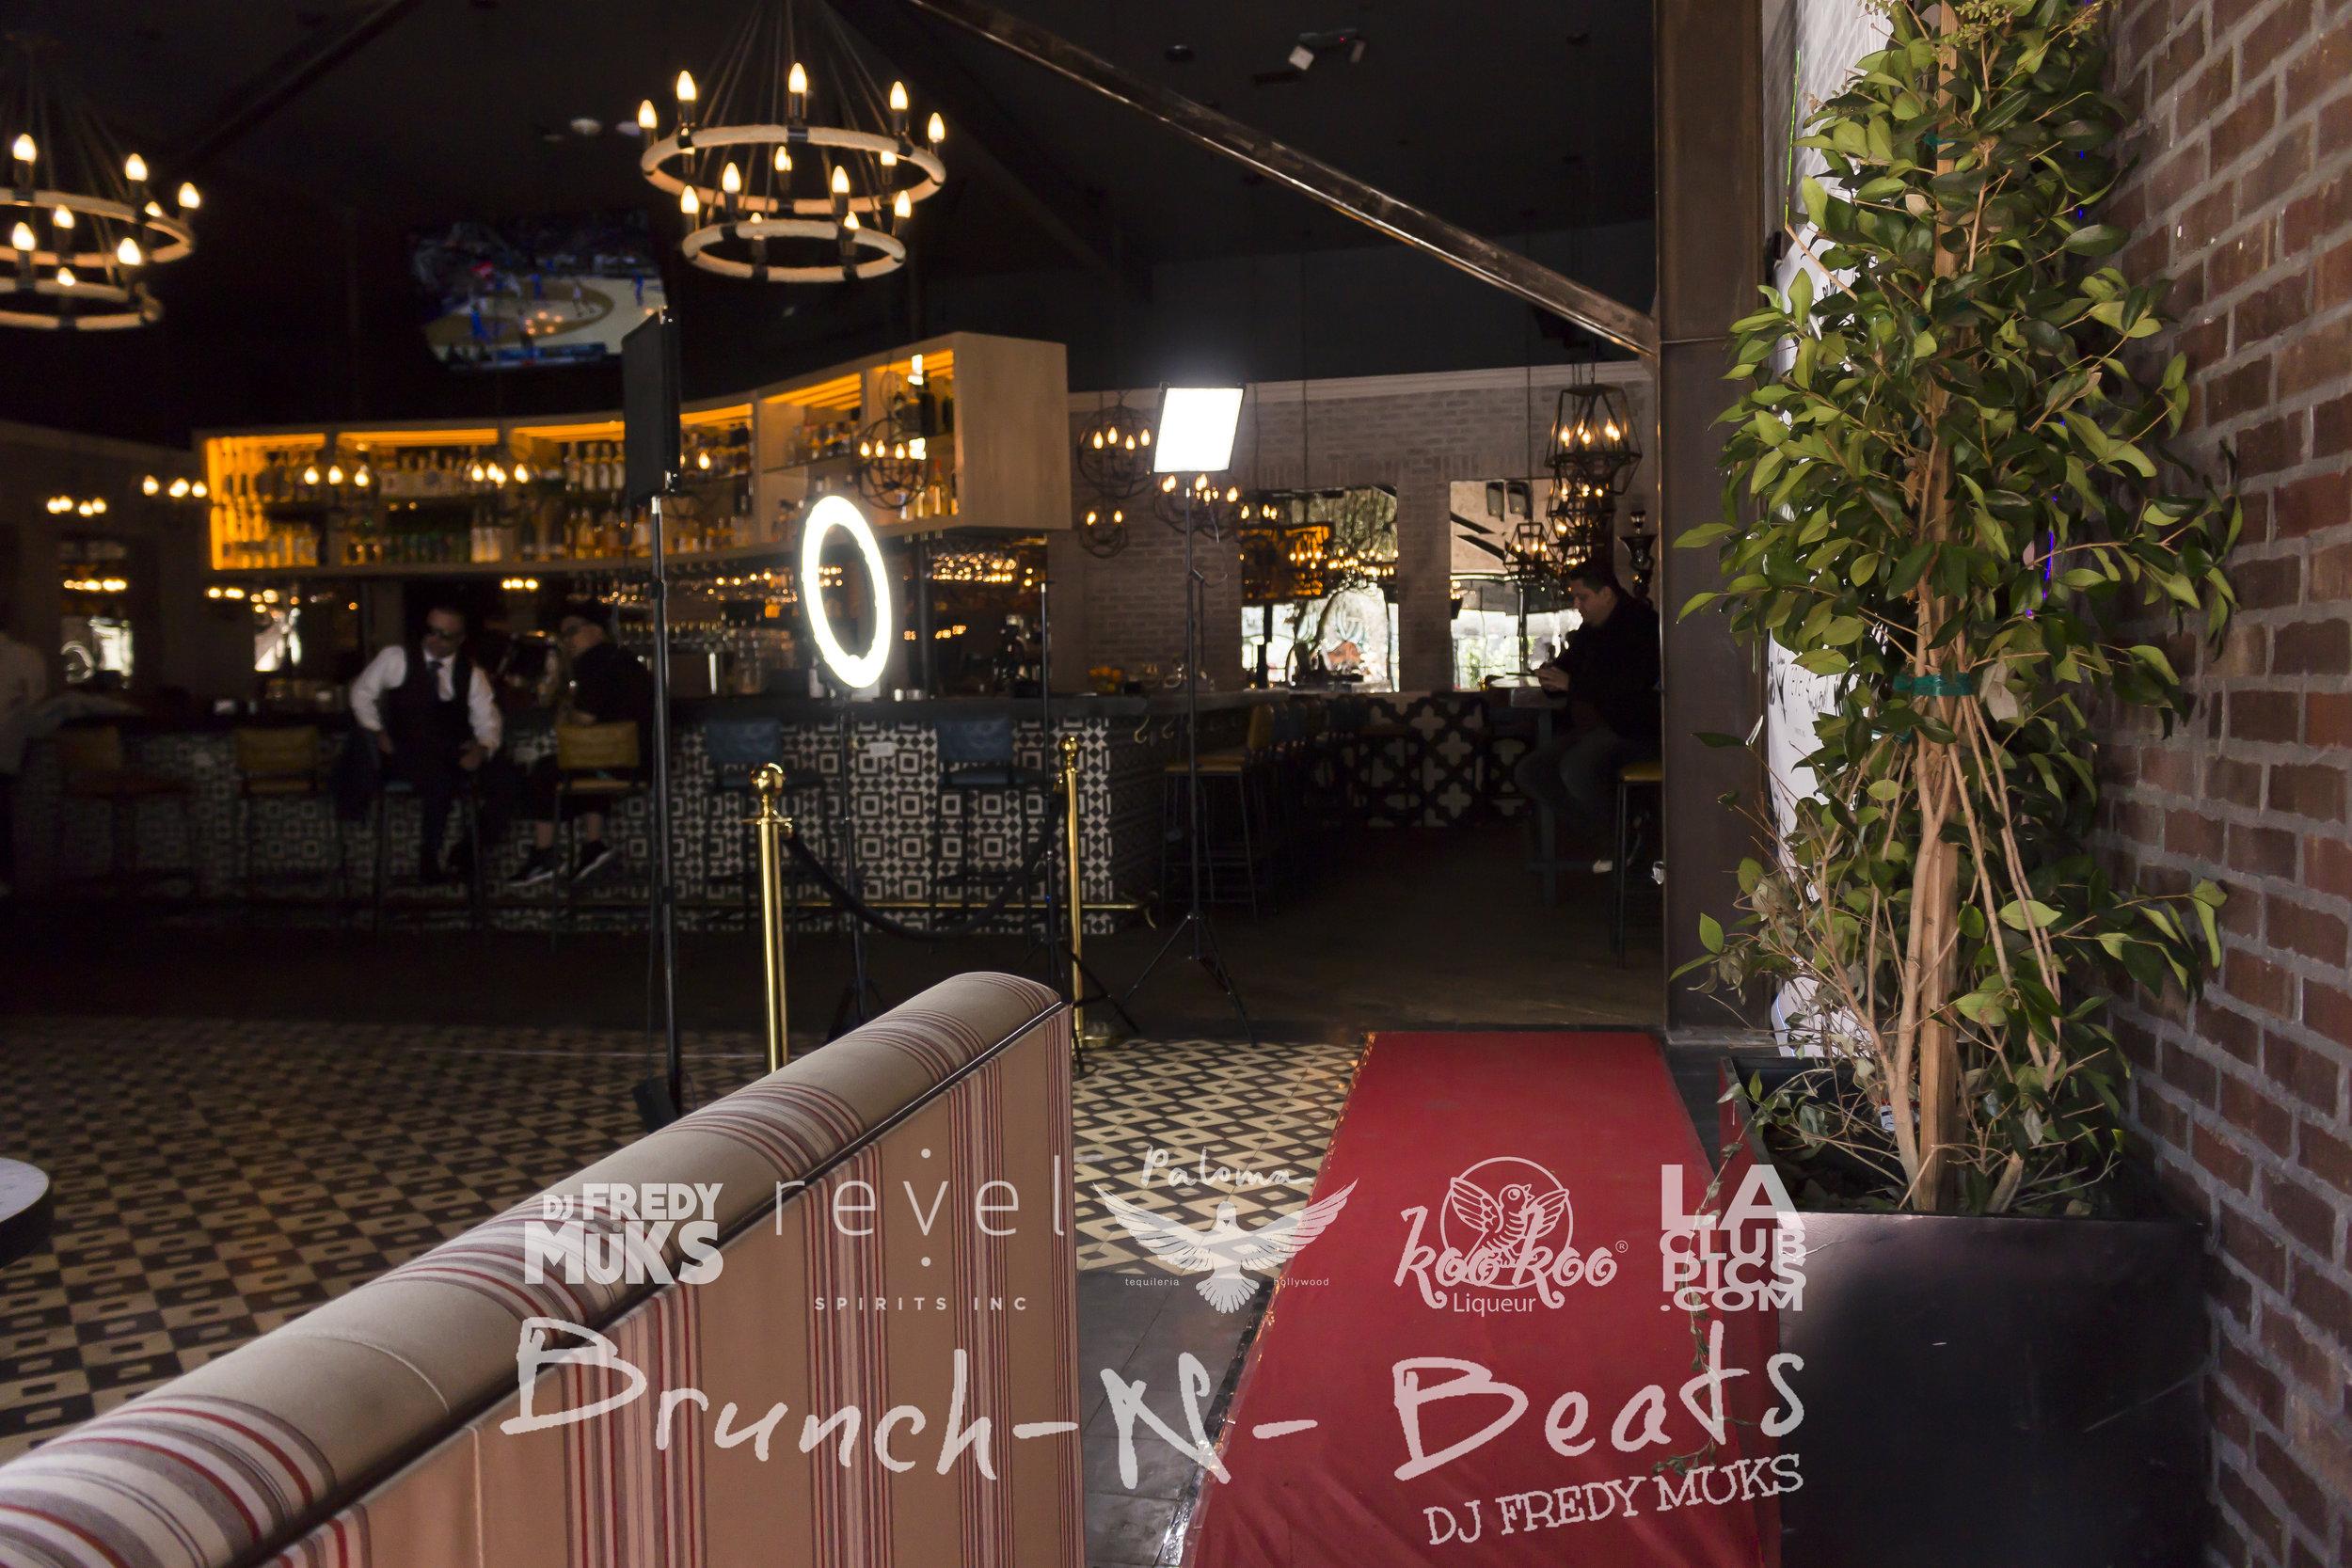 Brunch-N-Beats - Paloma Hollywood - 02-25-18_9.jpg